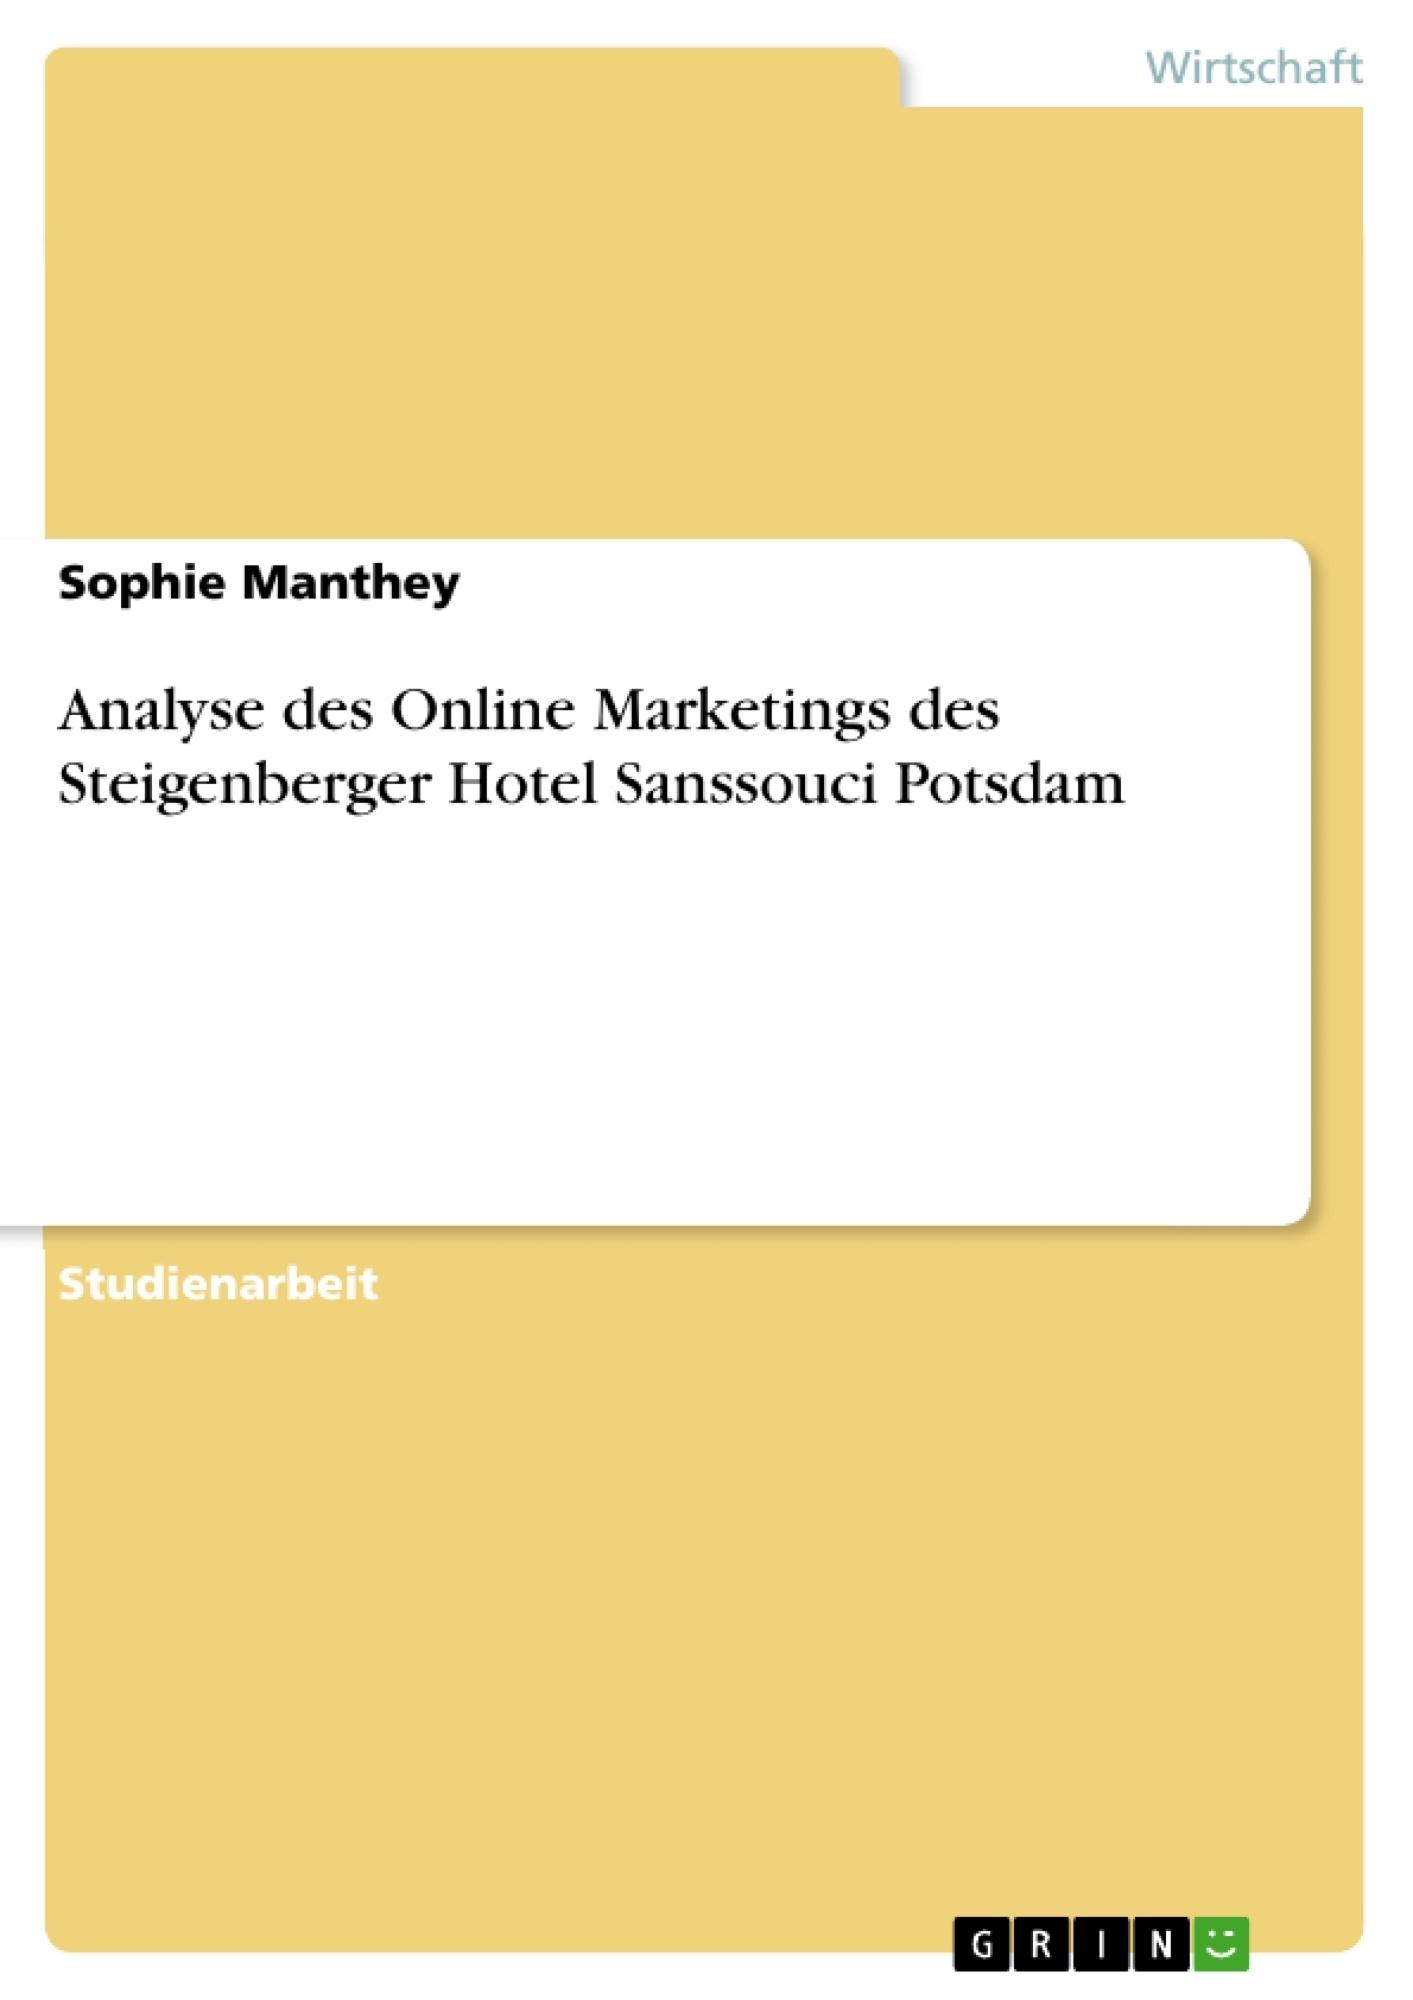 Titel: Analyse des Online Marketings des Steigenberger Hotel Sanssouci Potsdam